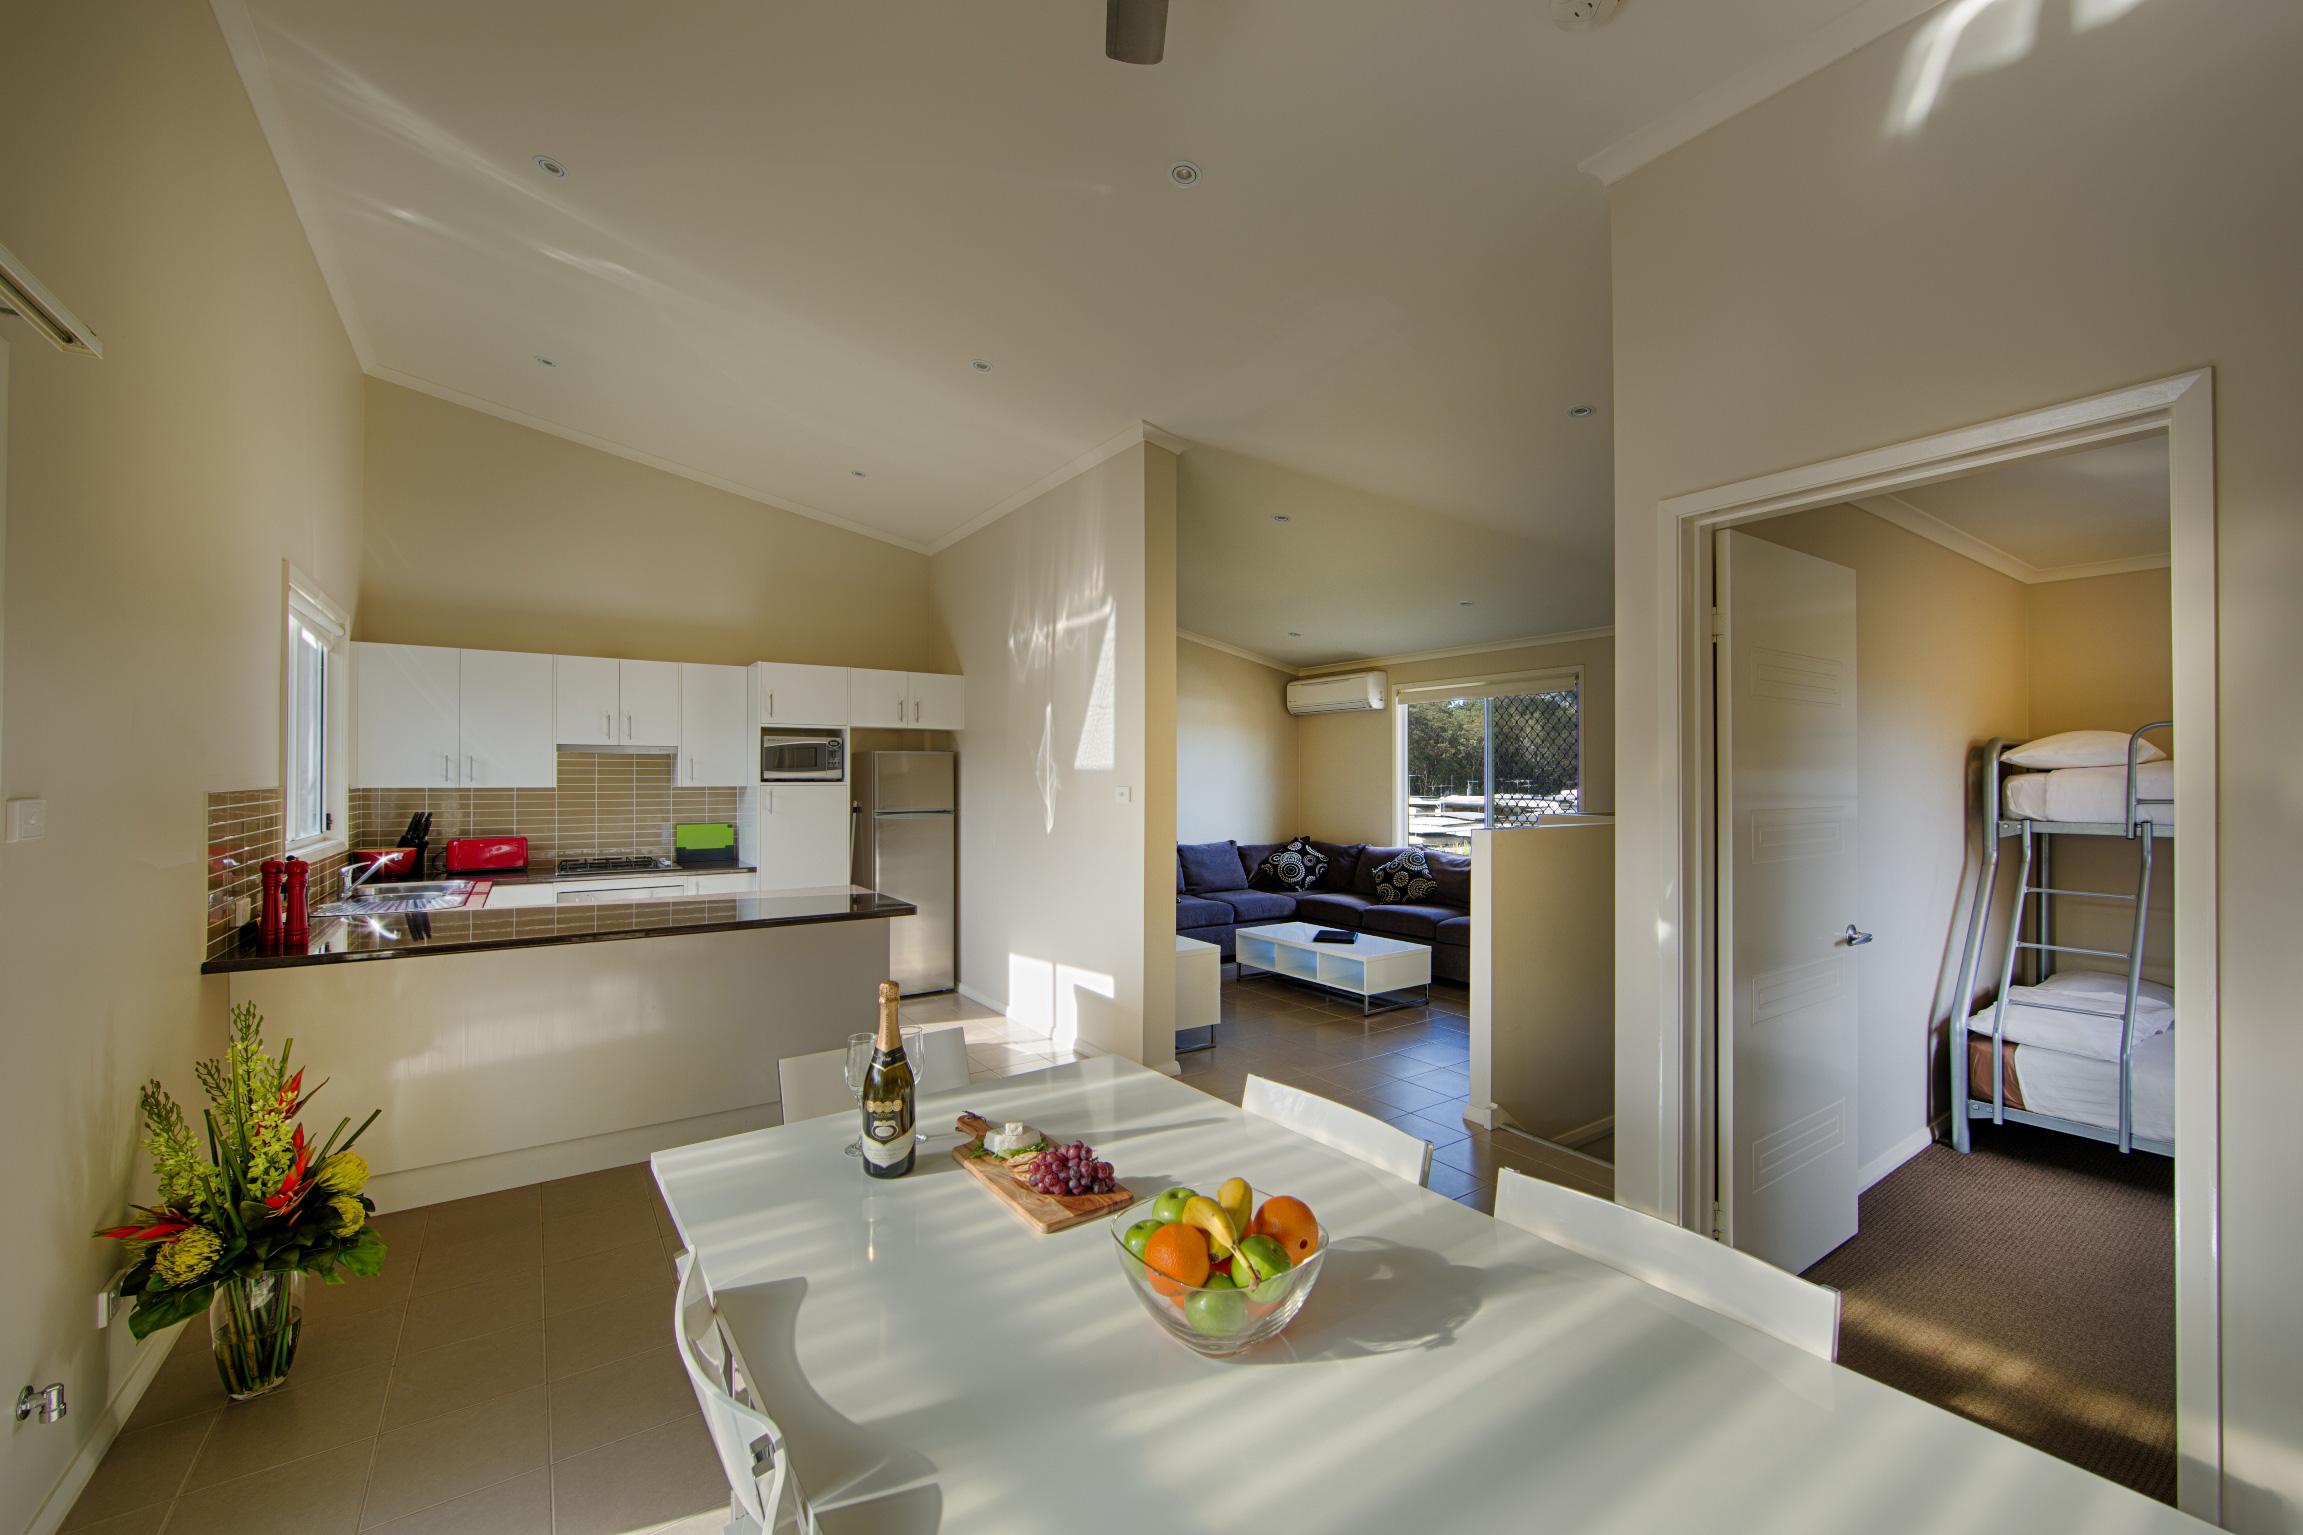 Apartment-Pic-2--kitchen-dining-bed-kitchen.jpg